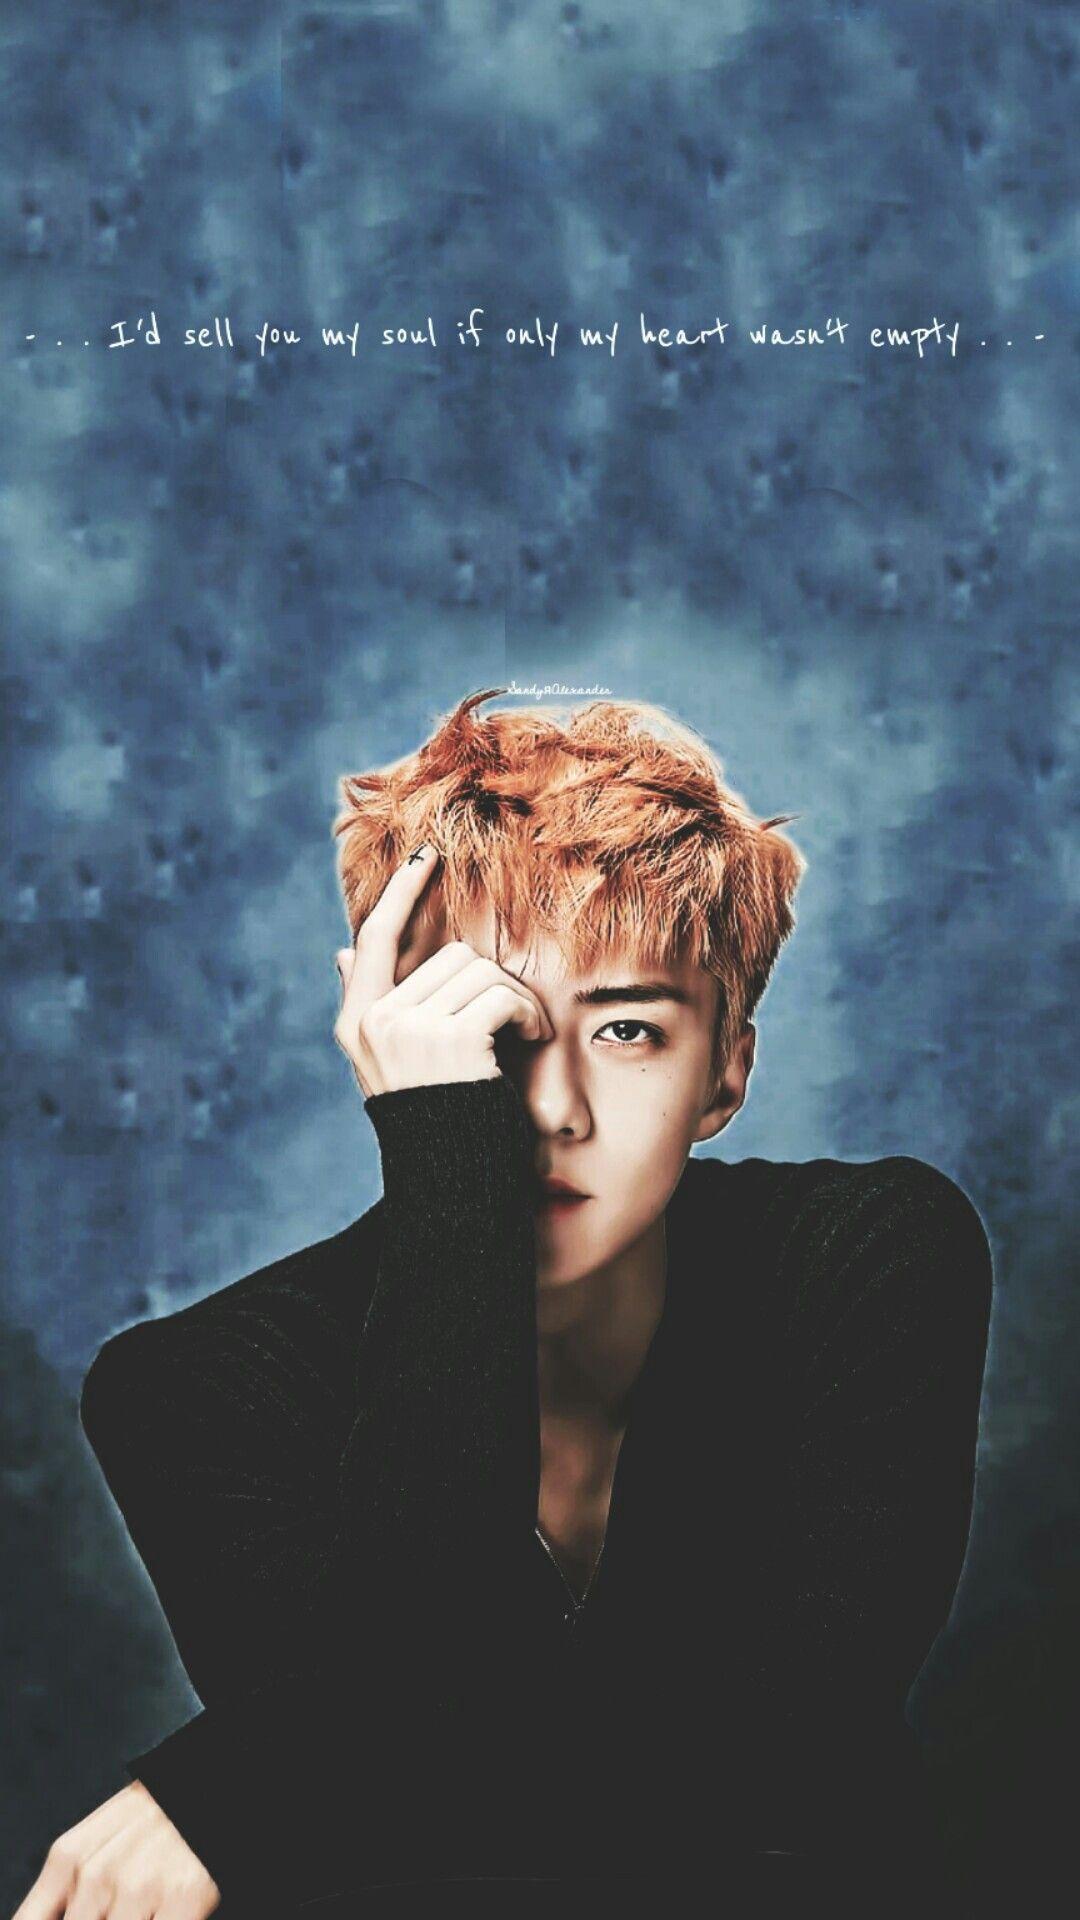 exo wallpaper – #sehun – ♡ | Exo-L ♕♥ | Pinterest | Sehun, Exo …